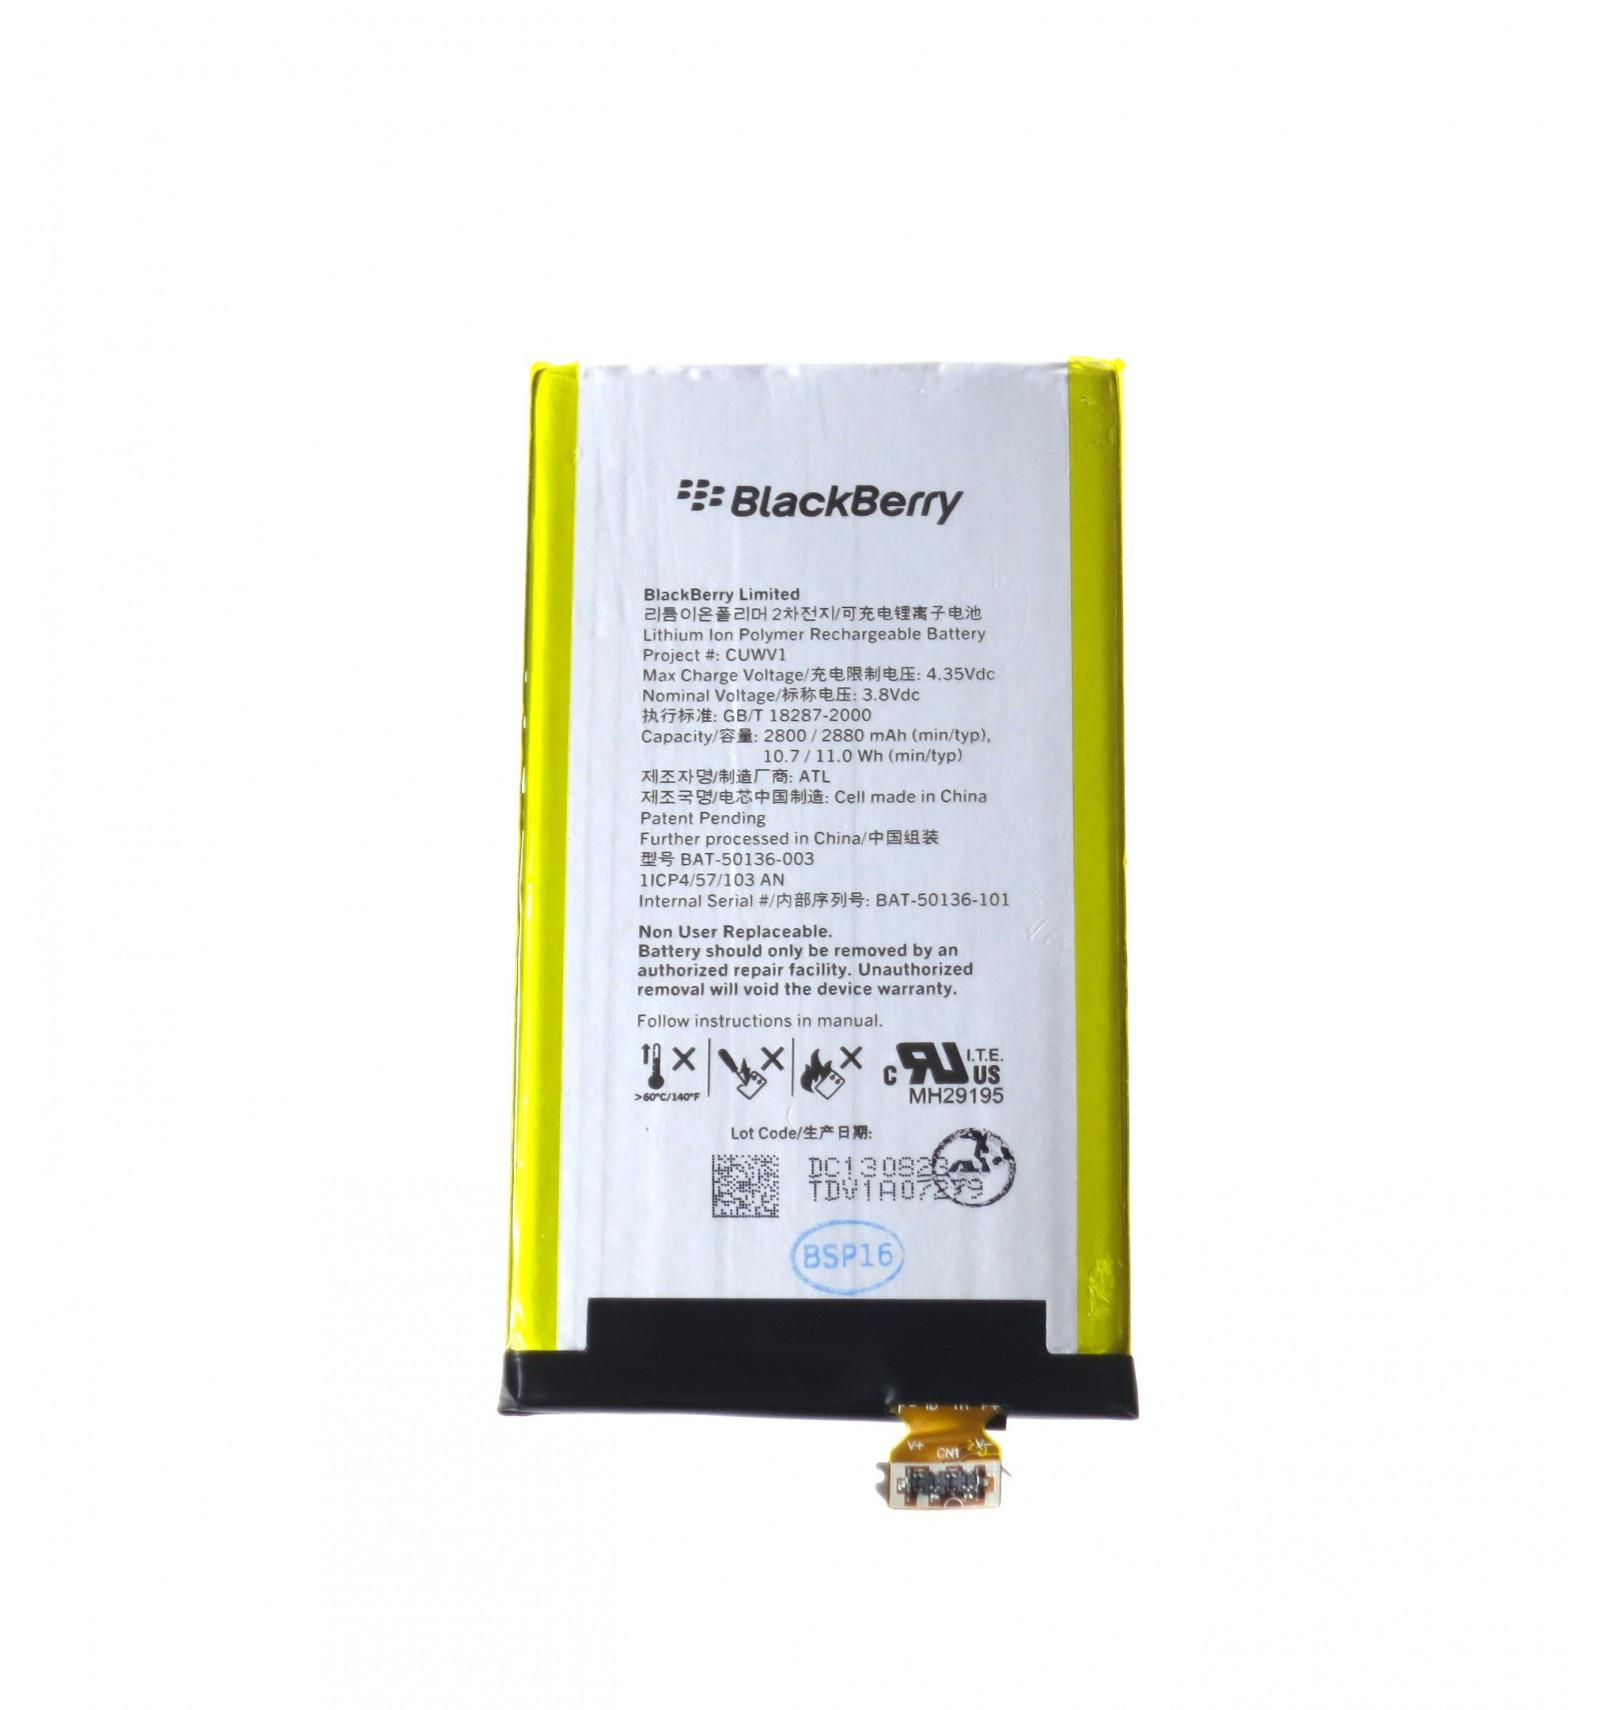 Battery replacement for Blackberry Z30 | lcdpartner com